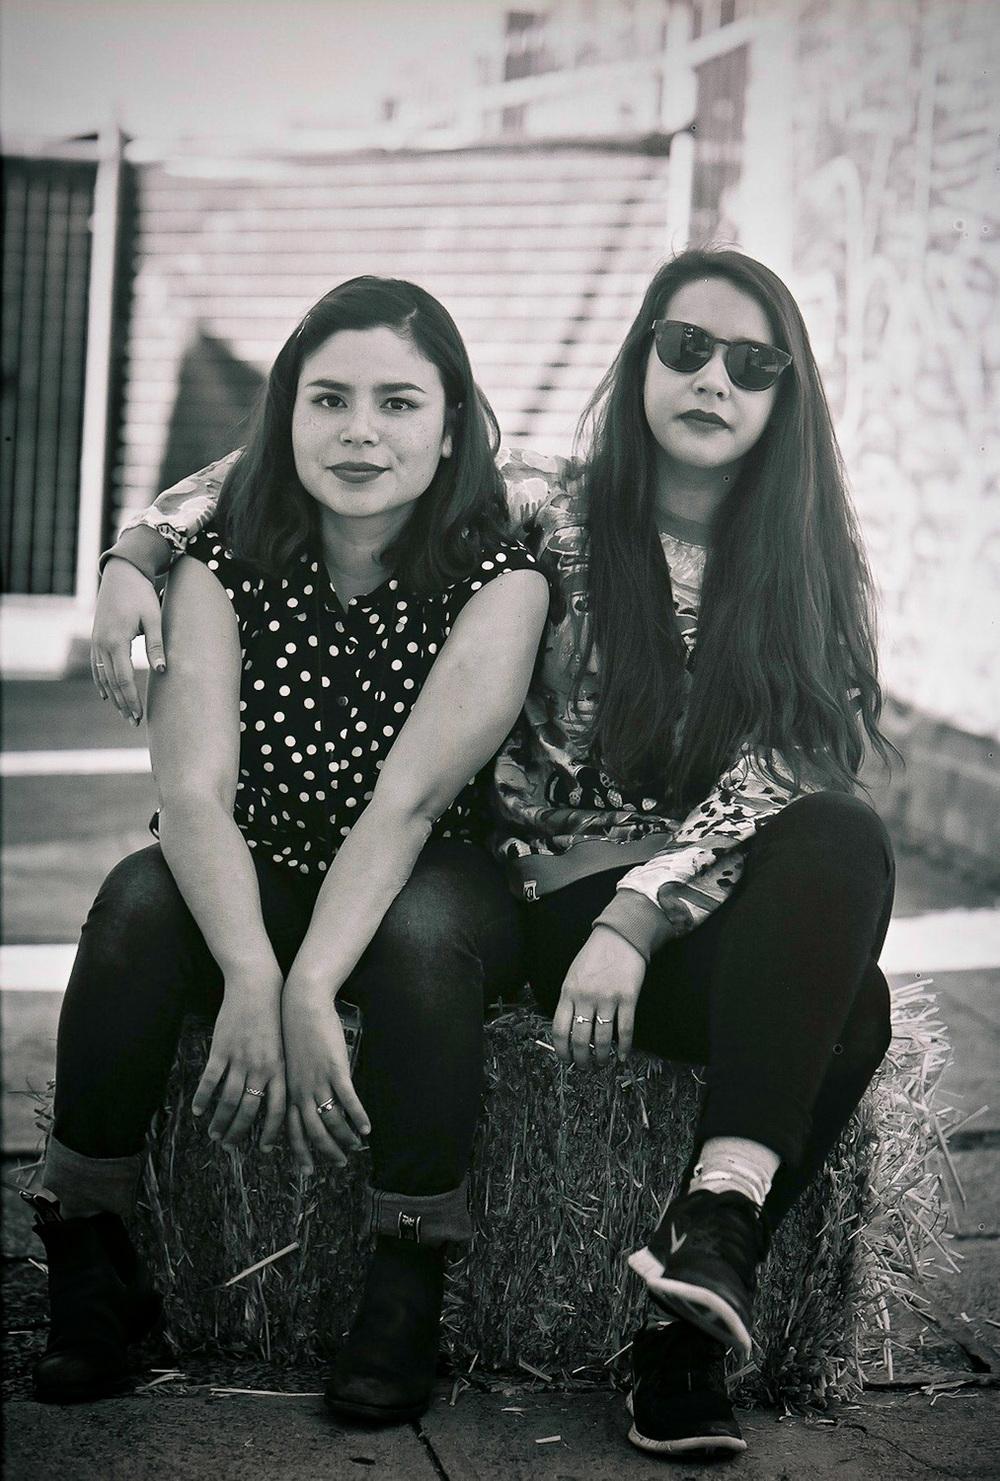 the ladies of bloods